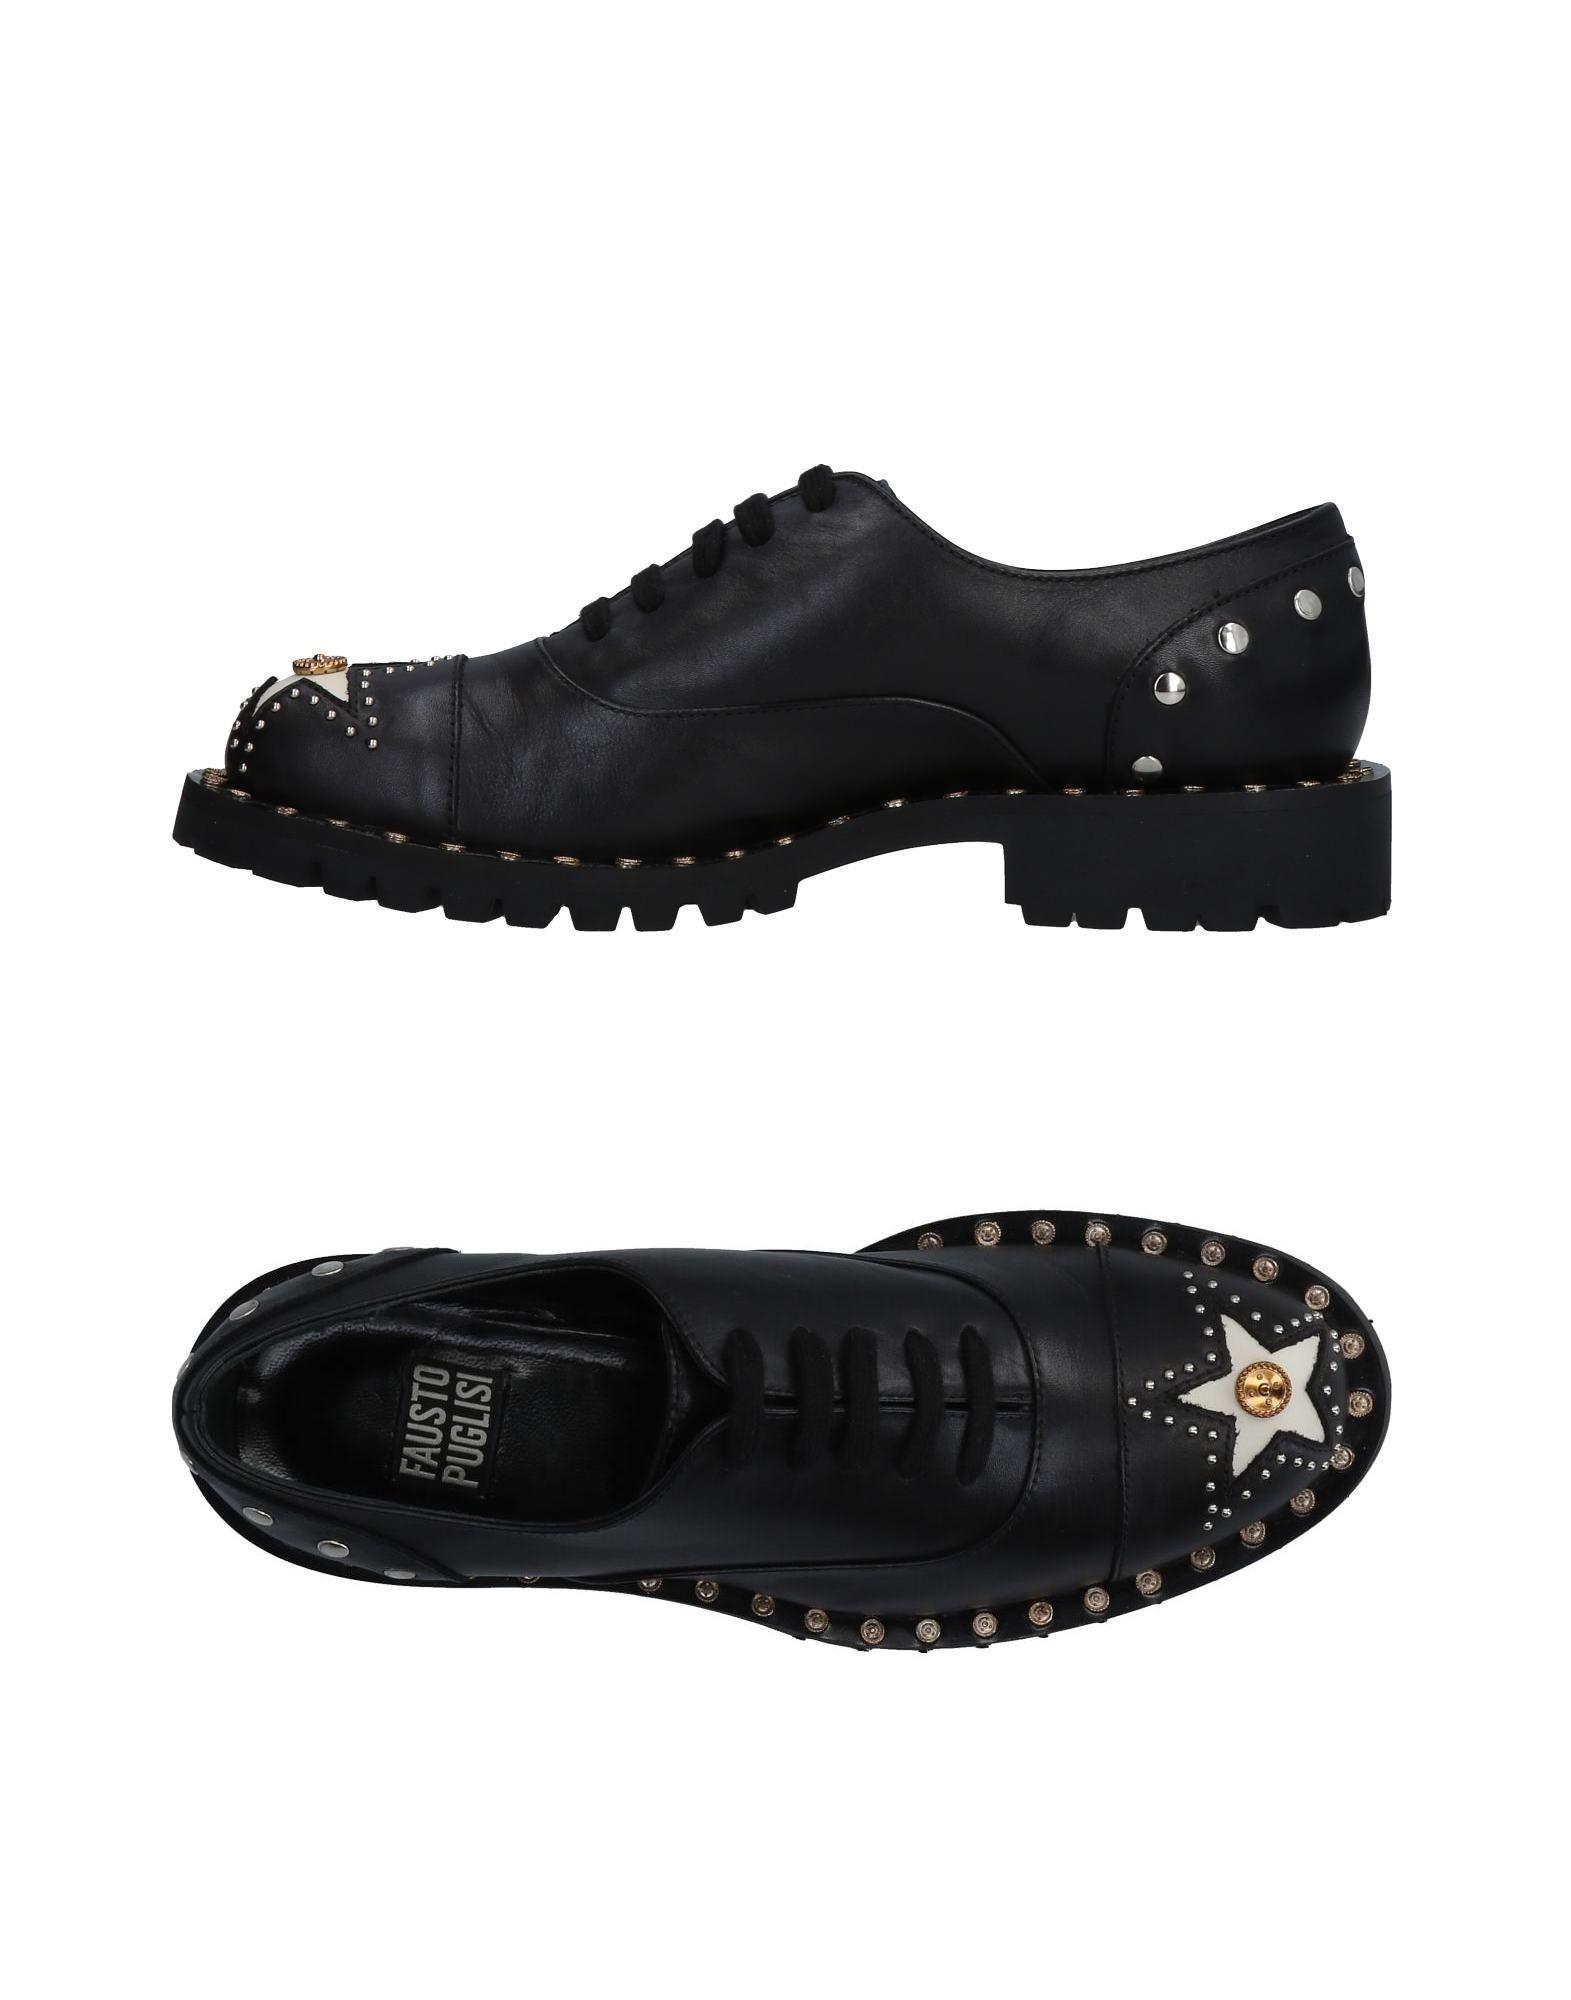 Fausto Puglisi Beliebte Schnürschuhe Damen  11474600OI Beliebte Puglisi Schuhe 619dc0